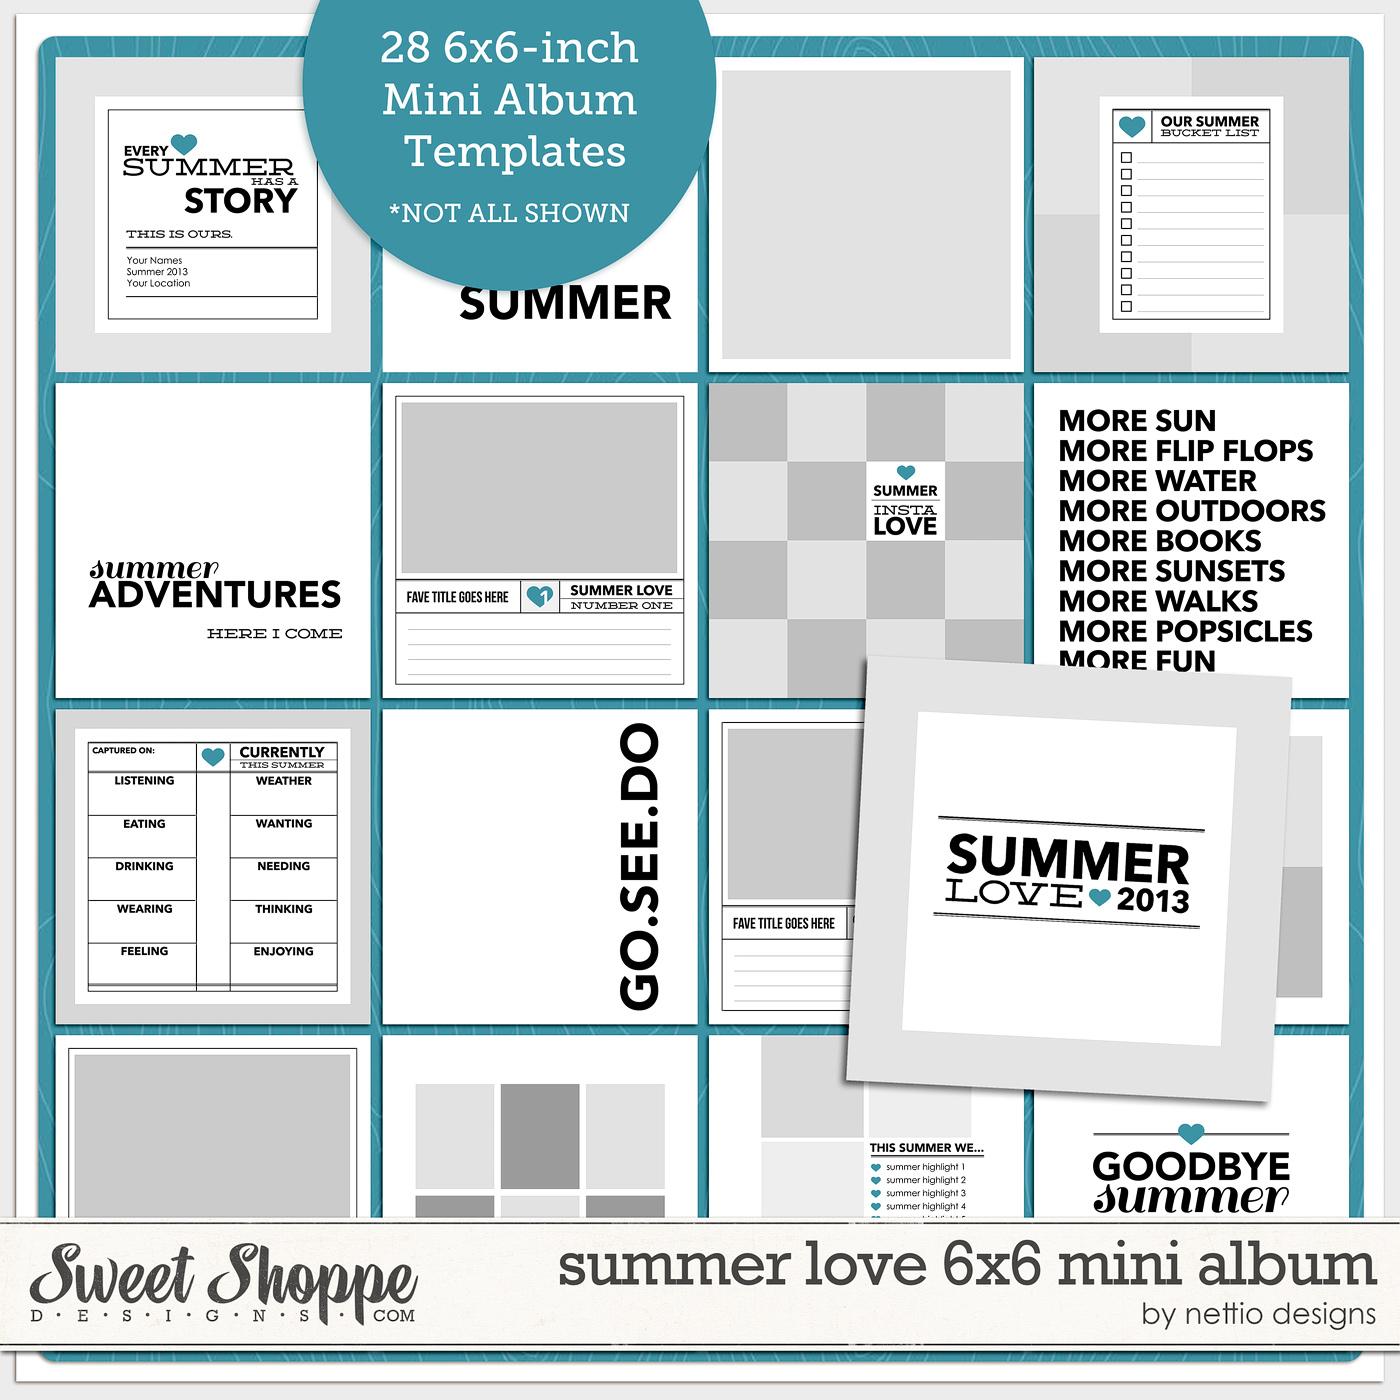 nettiodesigns_SummerLoveMini-prev-1400